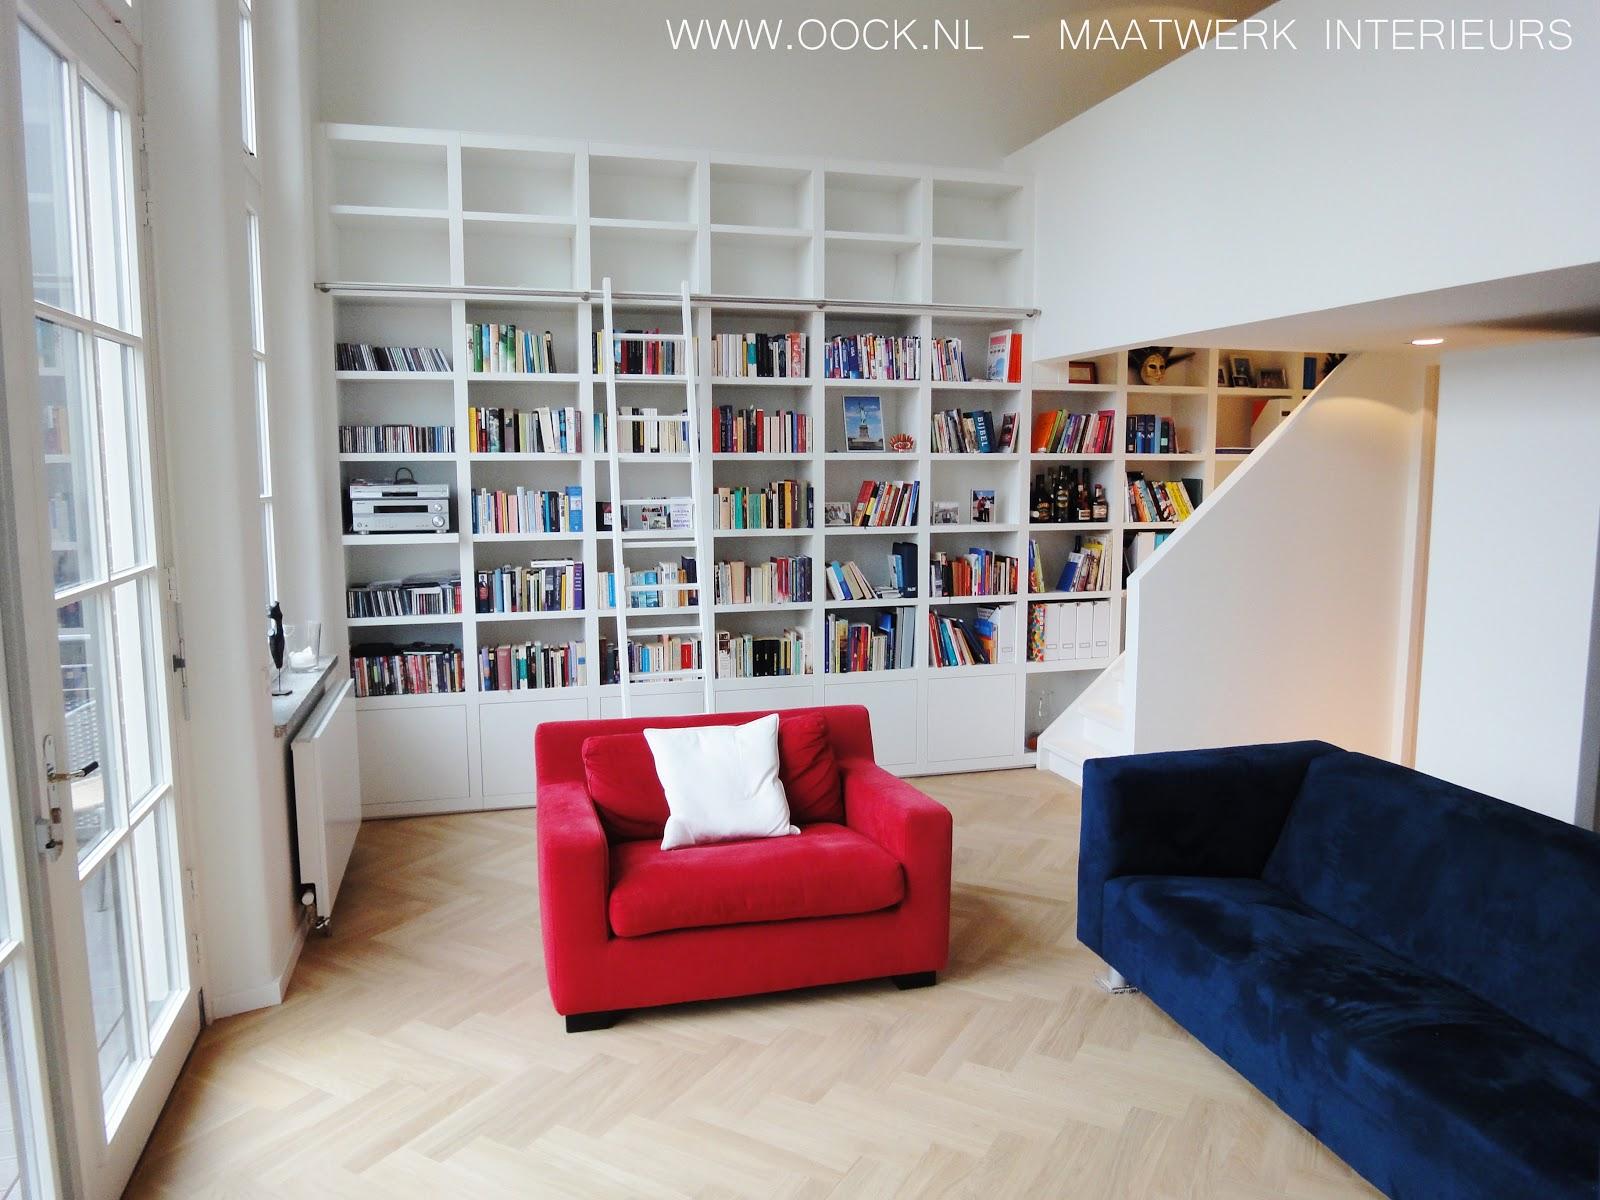 Interieurbouw: Moderne houten boekenkasten